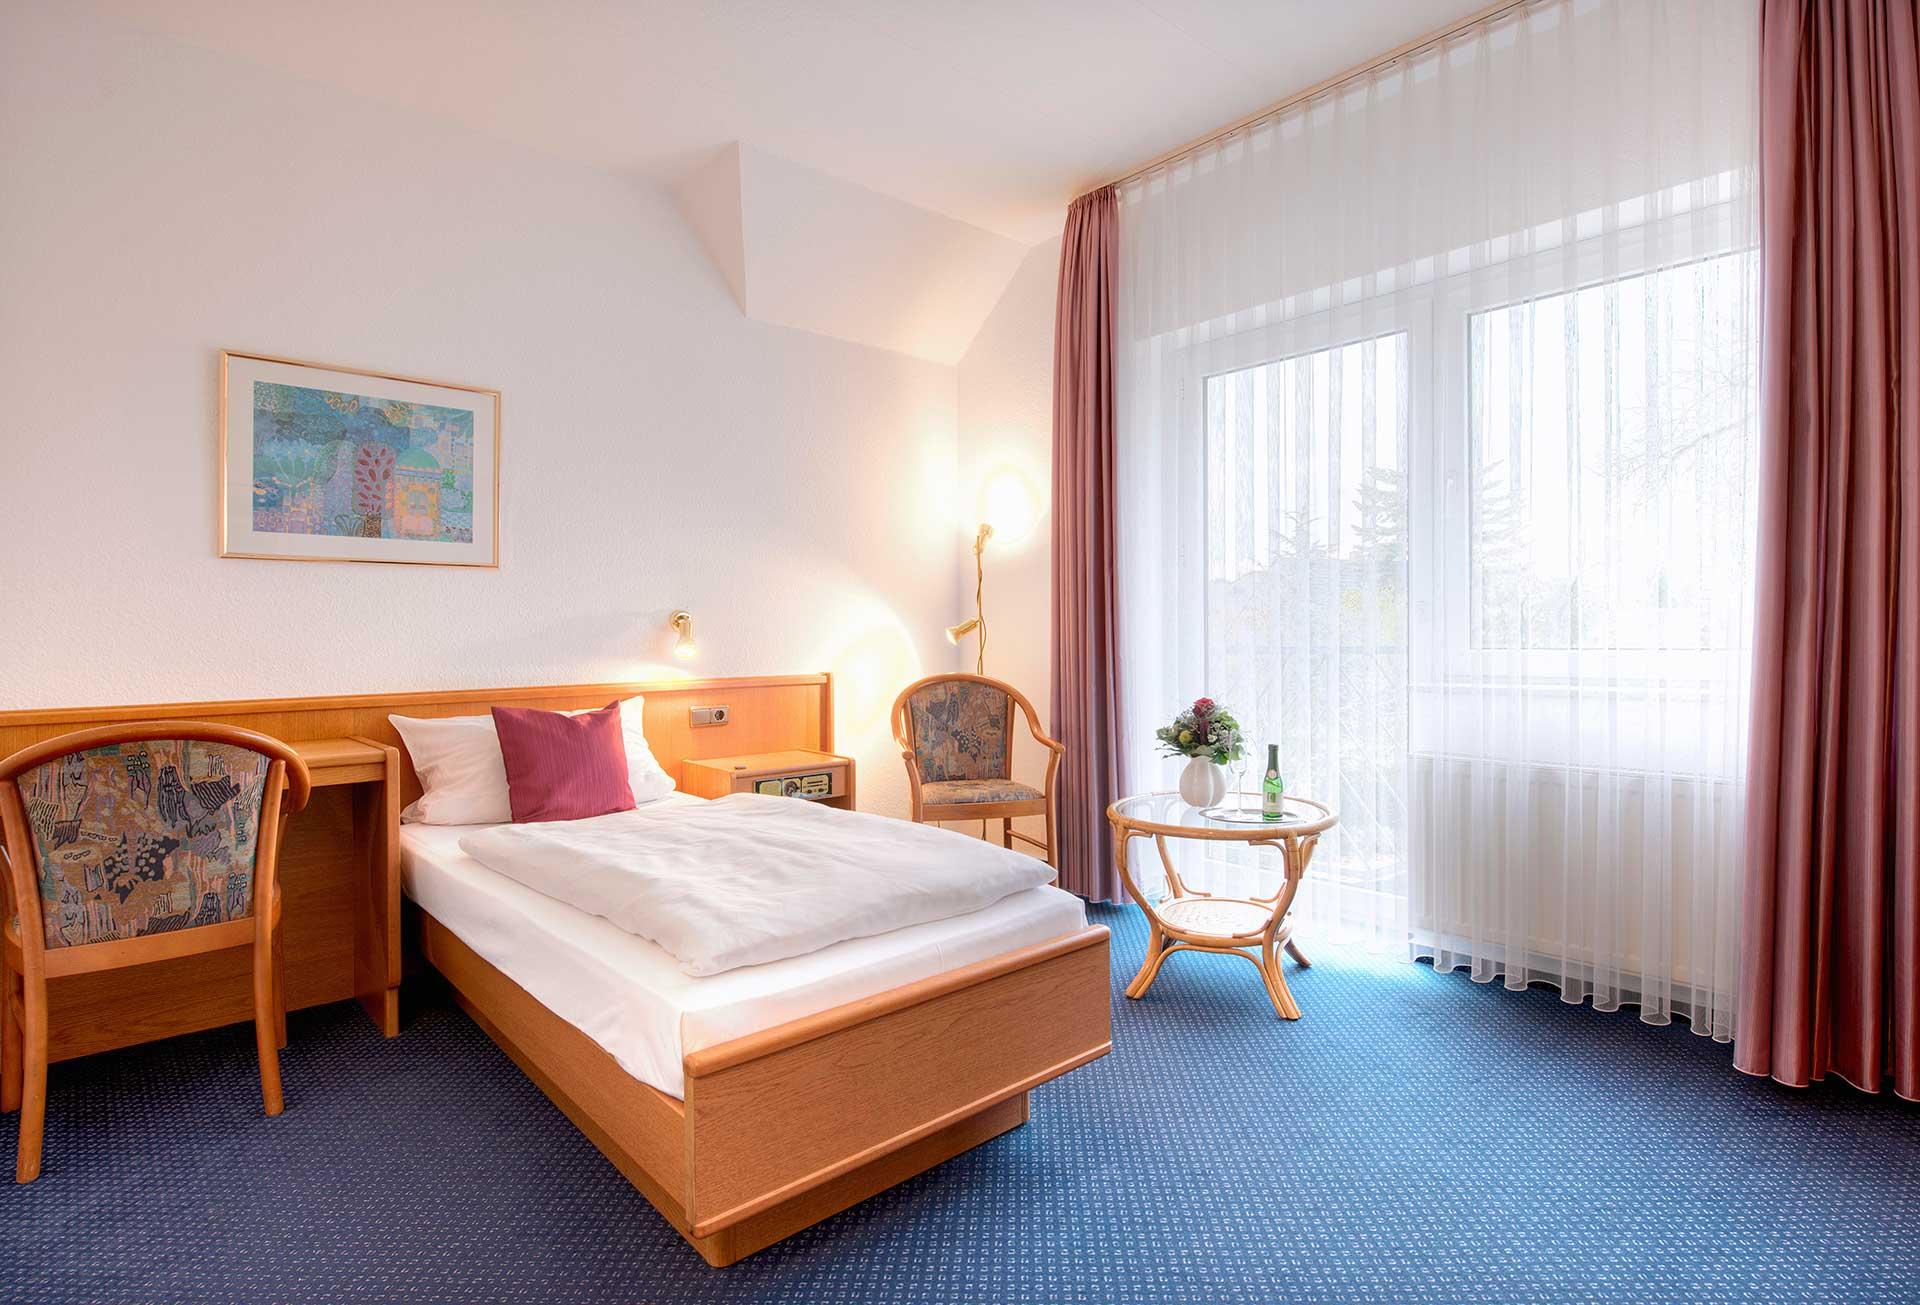 Hotel - Single Rooms